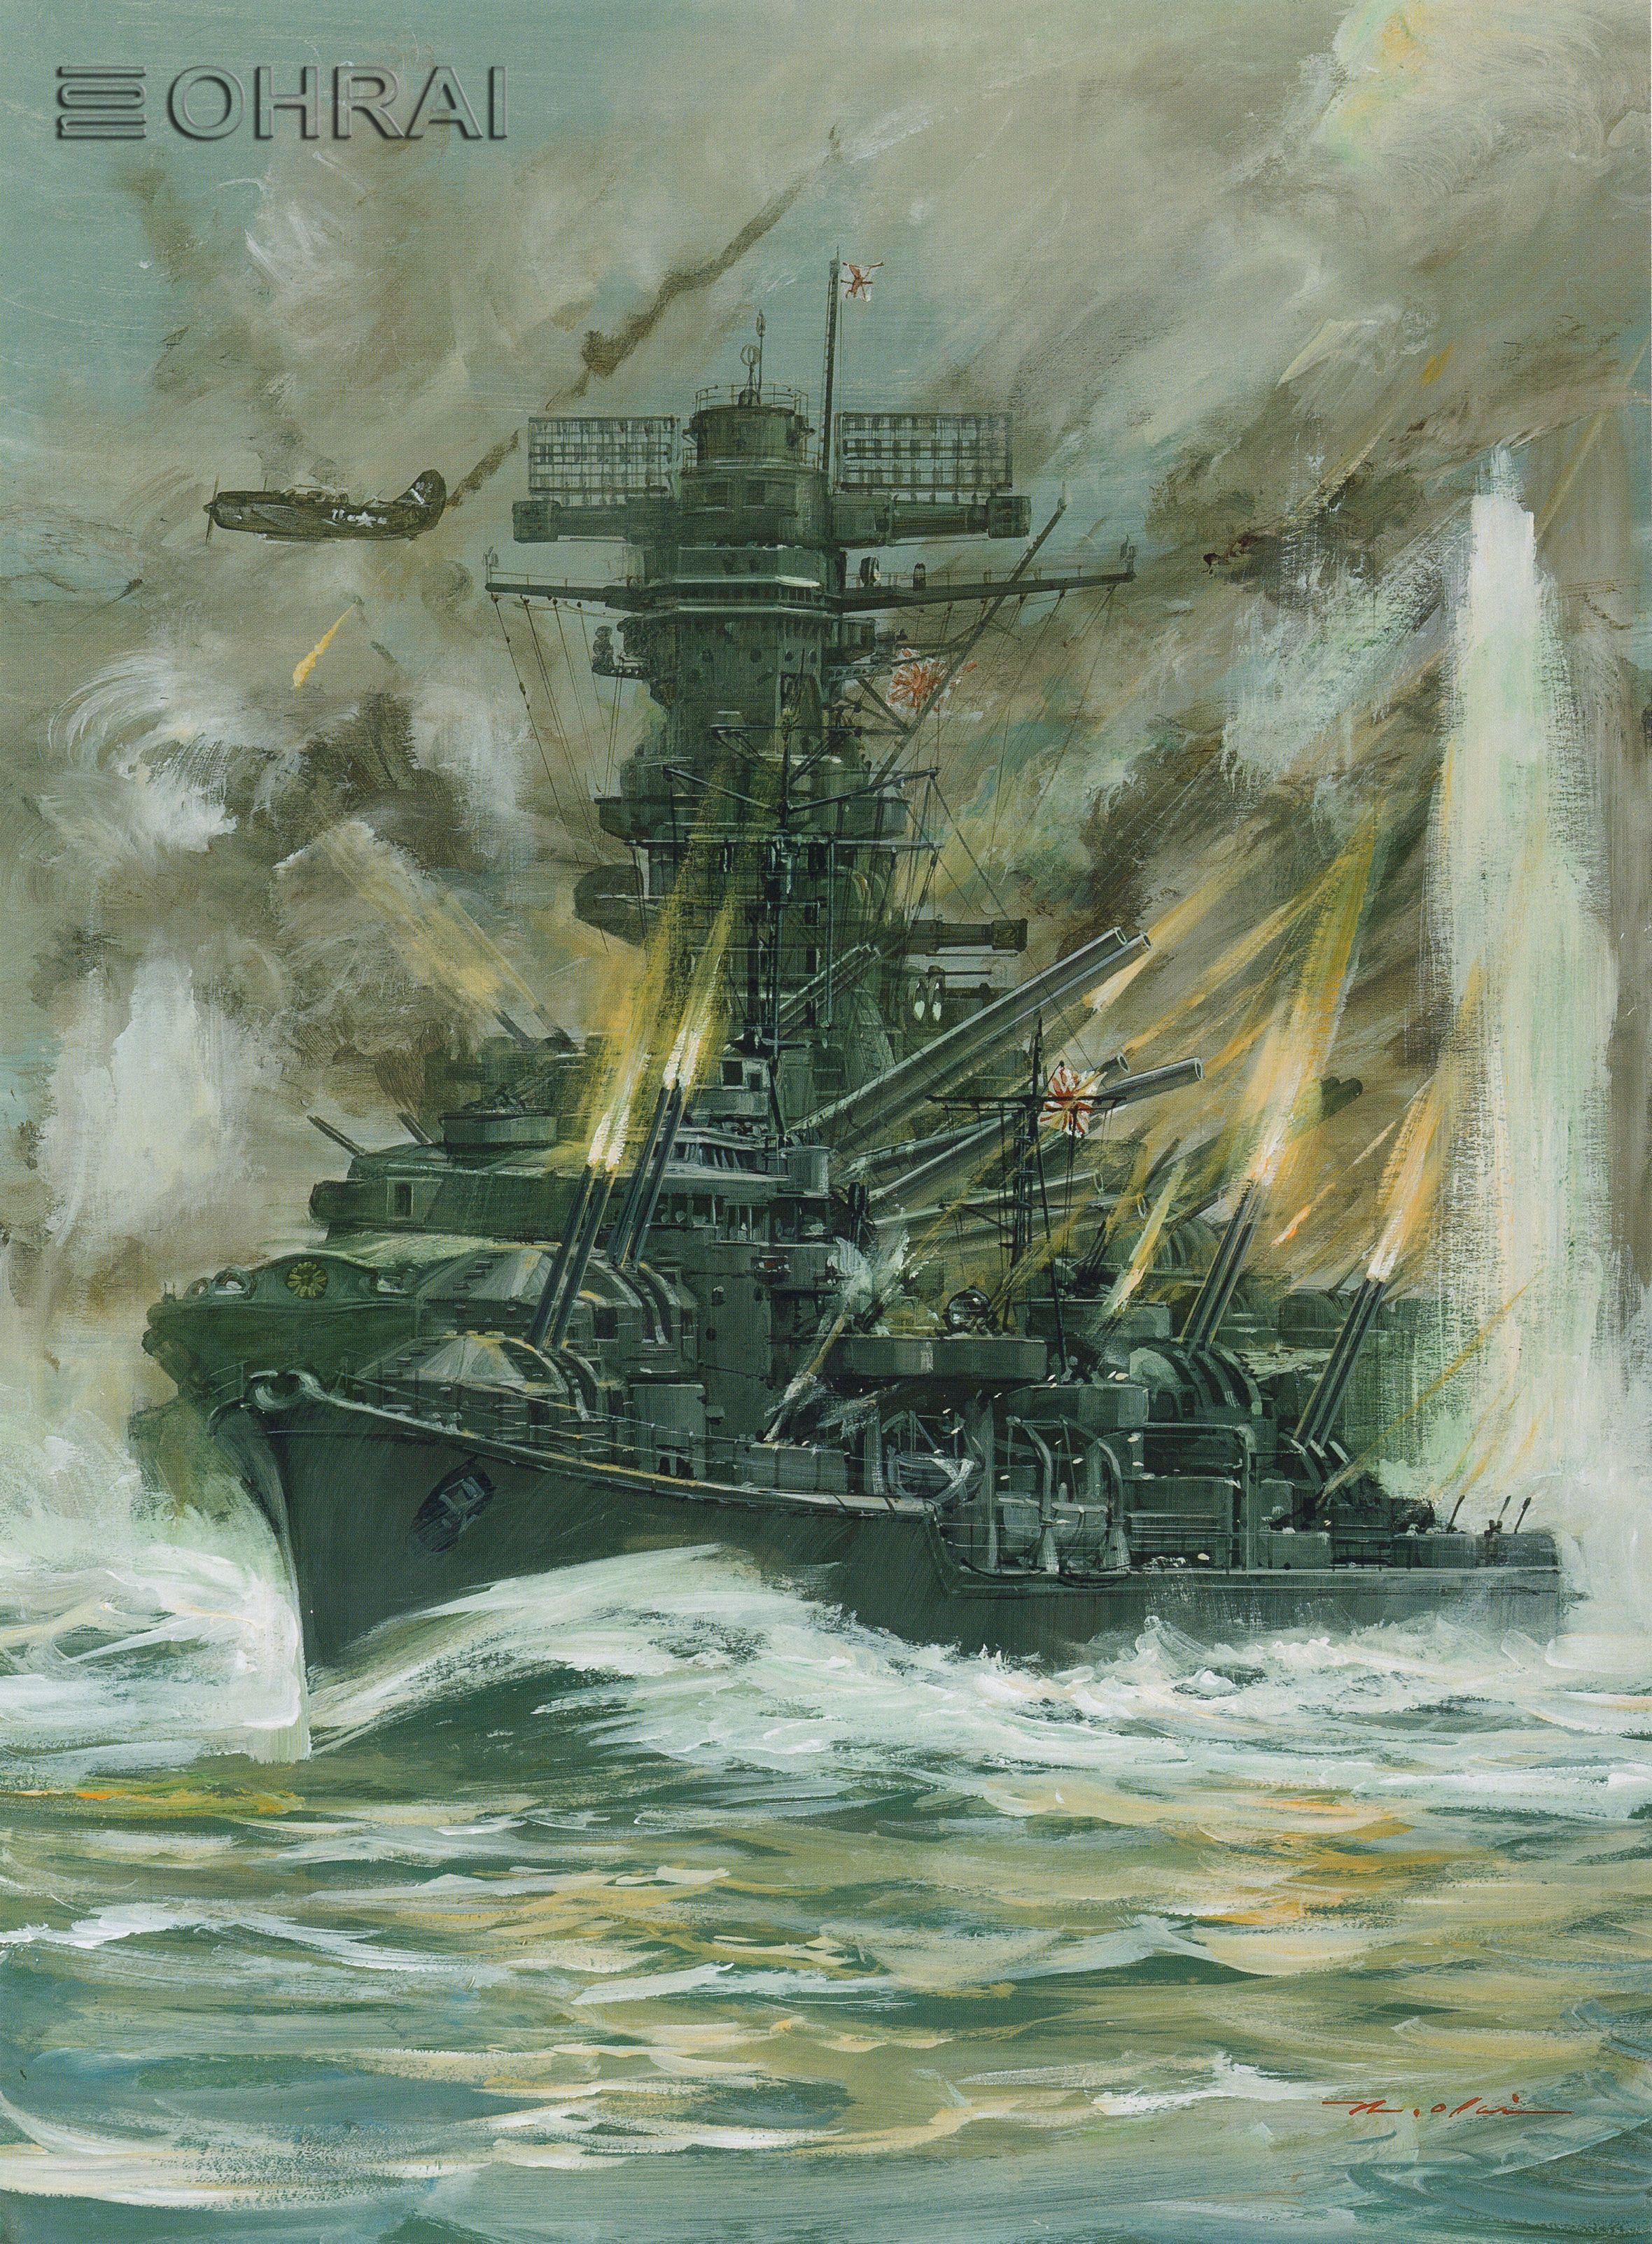 1987 12 激闘駆逐艦隊 著 倉橋 友二郎 朝日ソノラマ 奥